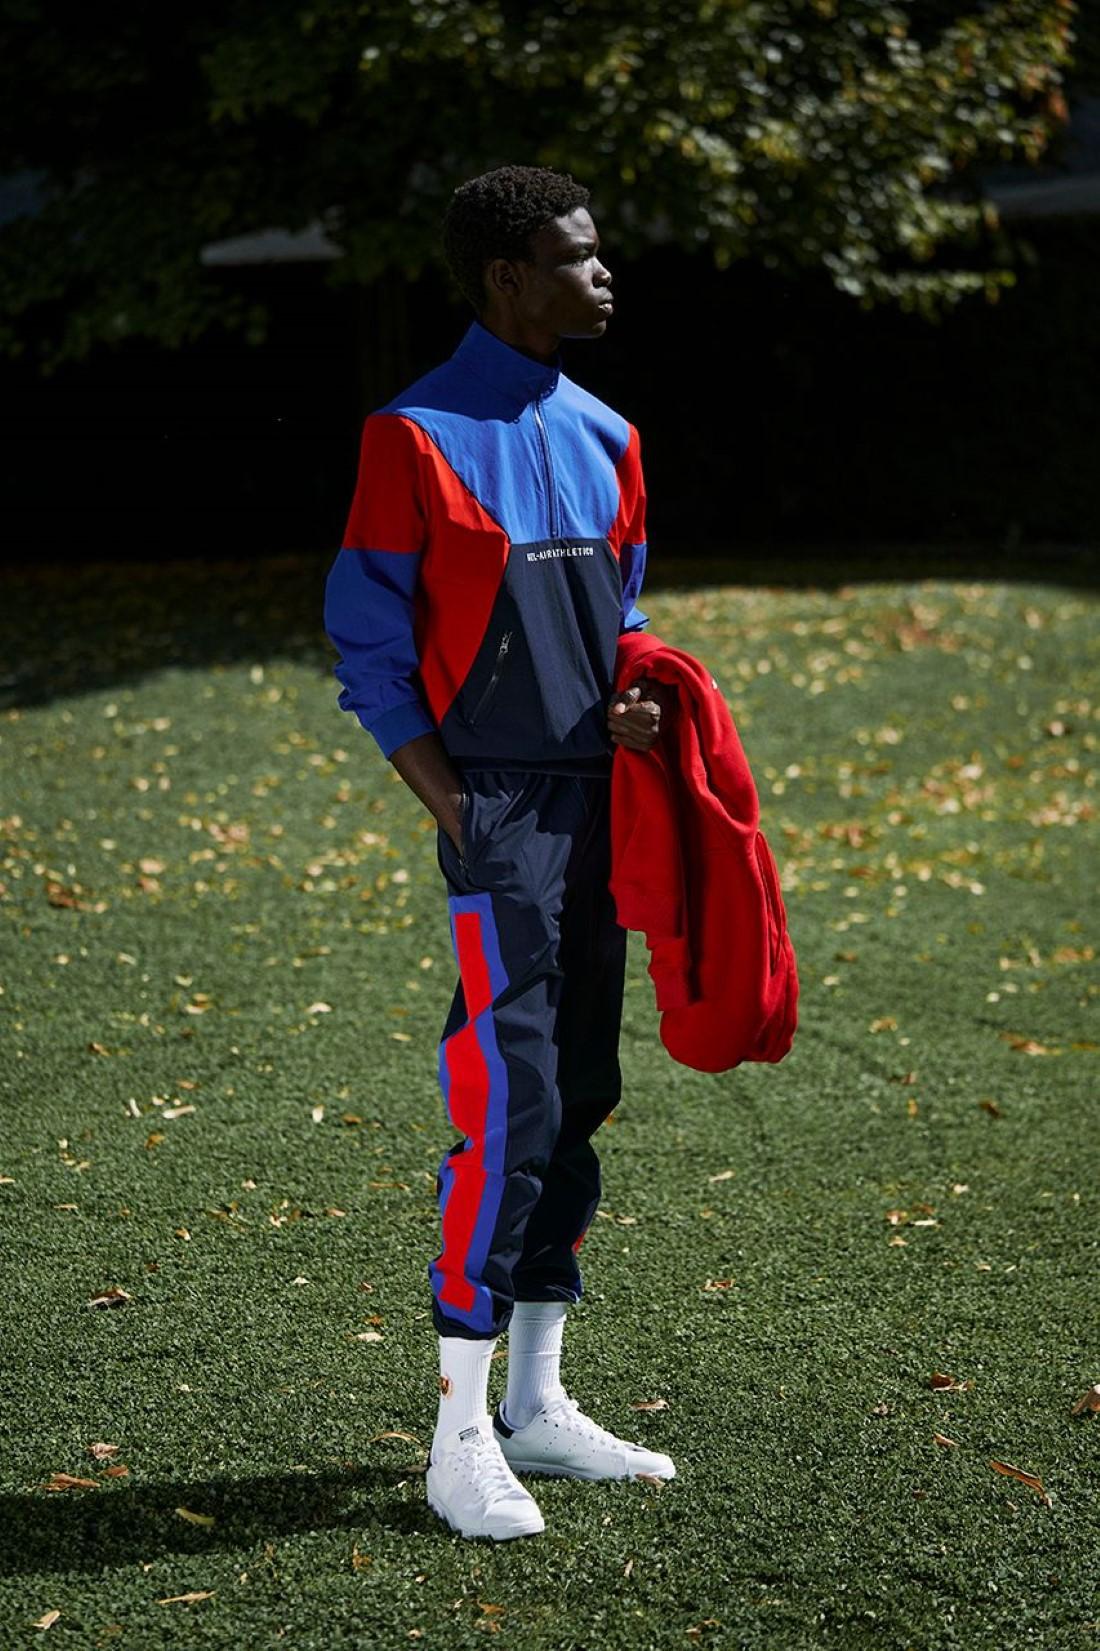 Will Smith - Bel Air Athletics Printemps-Été 2021